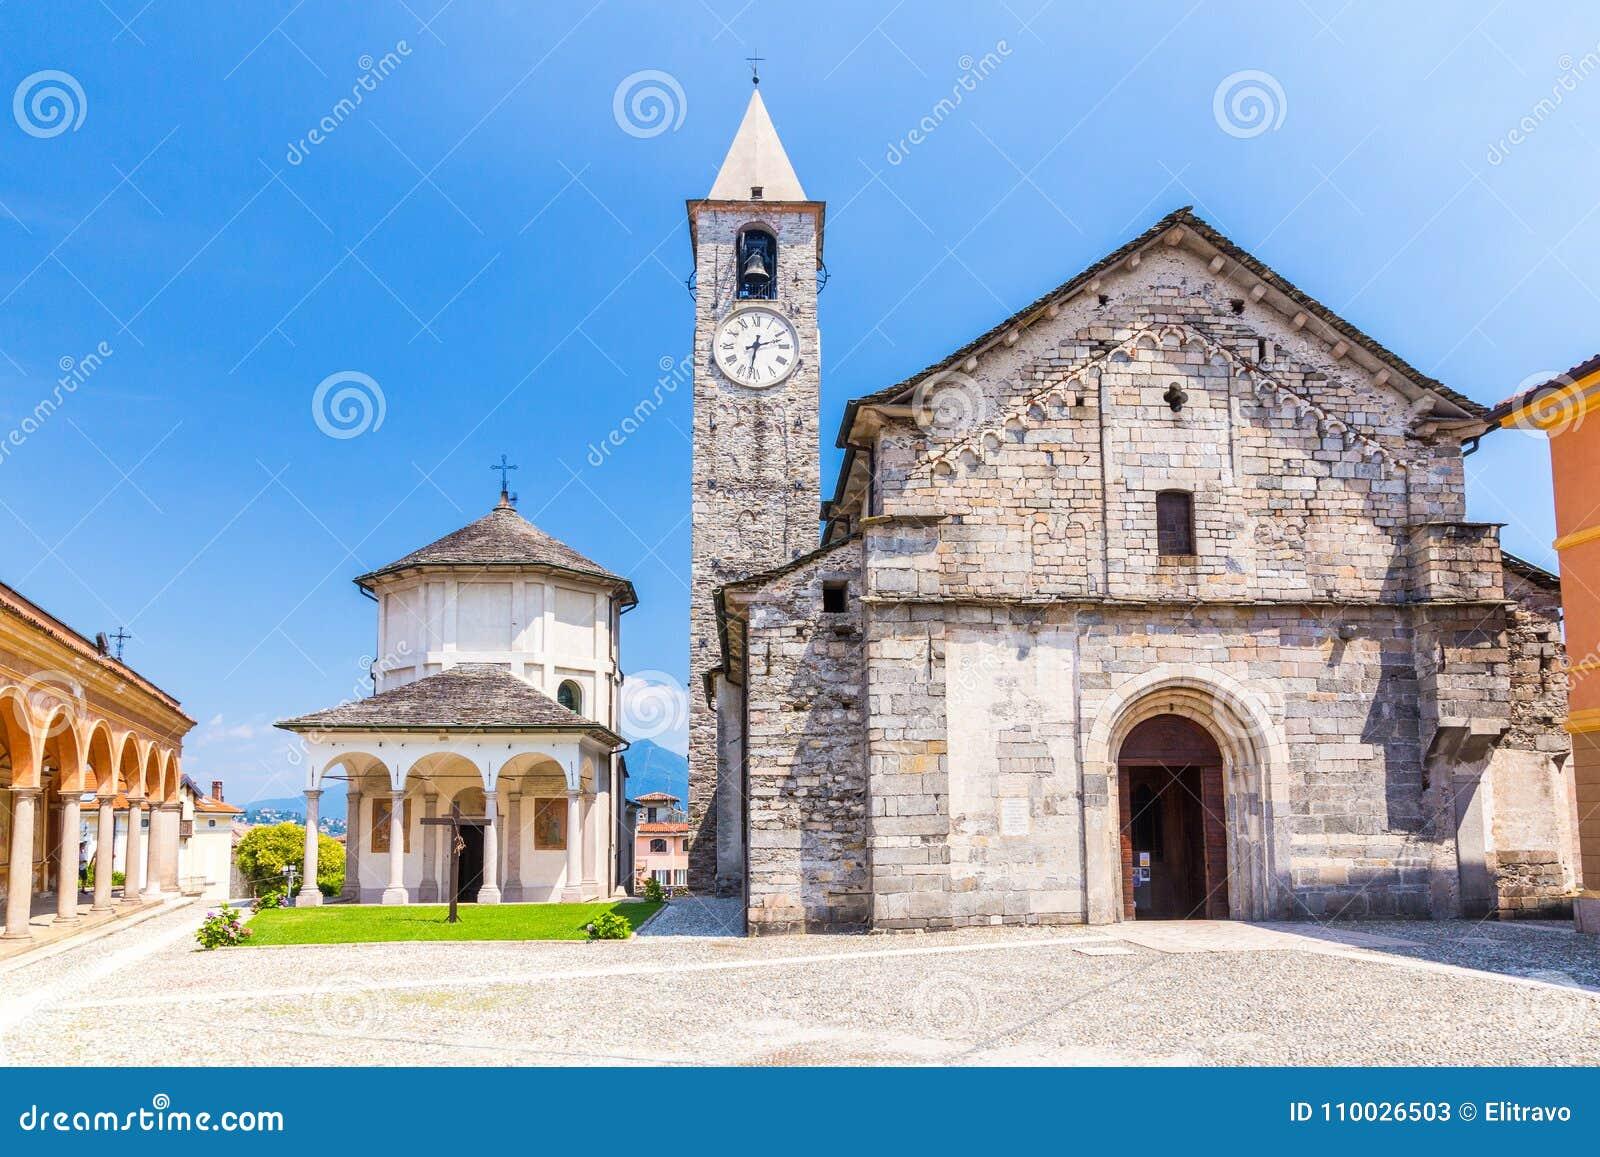 Kerk van Gervasio en Protasio in Baveno, op Meer maggiore, Pastei